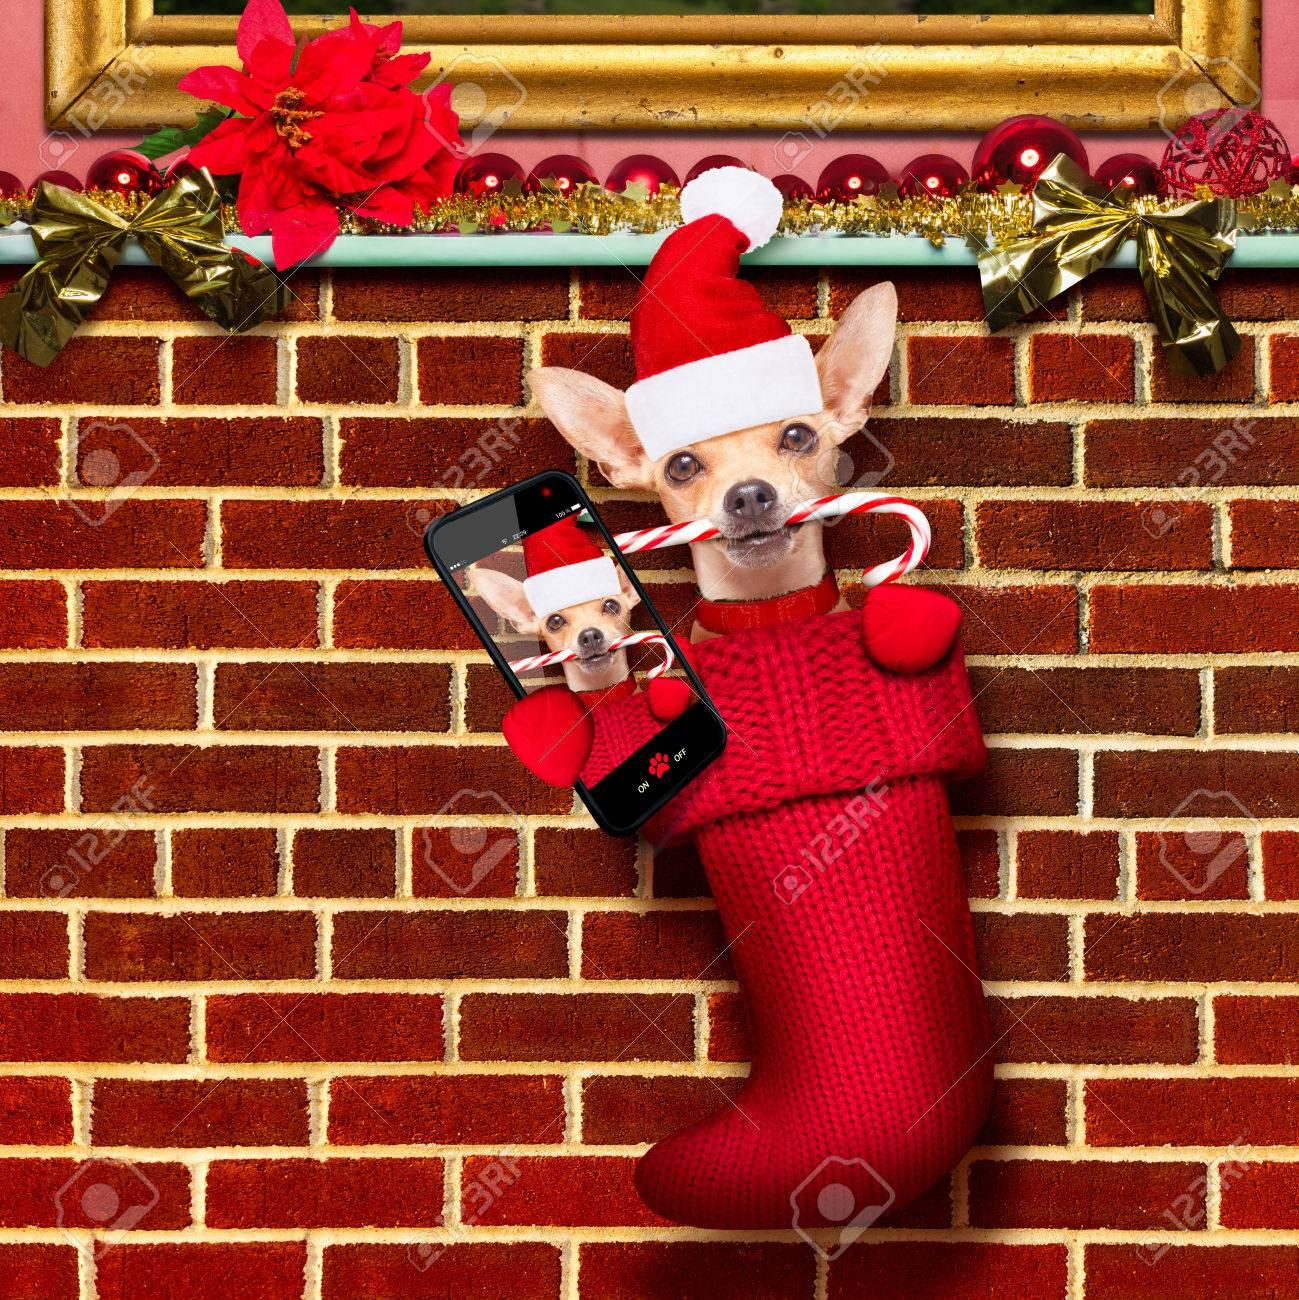 chihuahua dog inside xmas stockings or socks for christmas holidays hanging at the wall of - Xmas Stockings